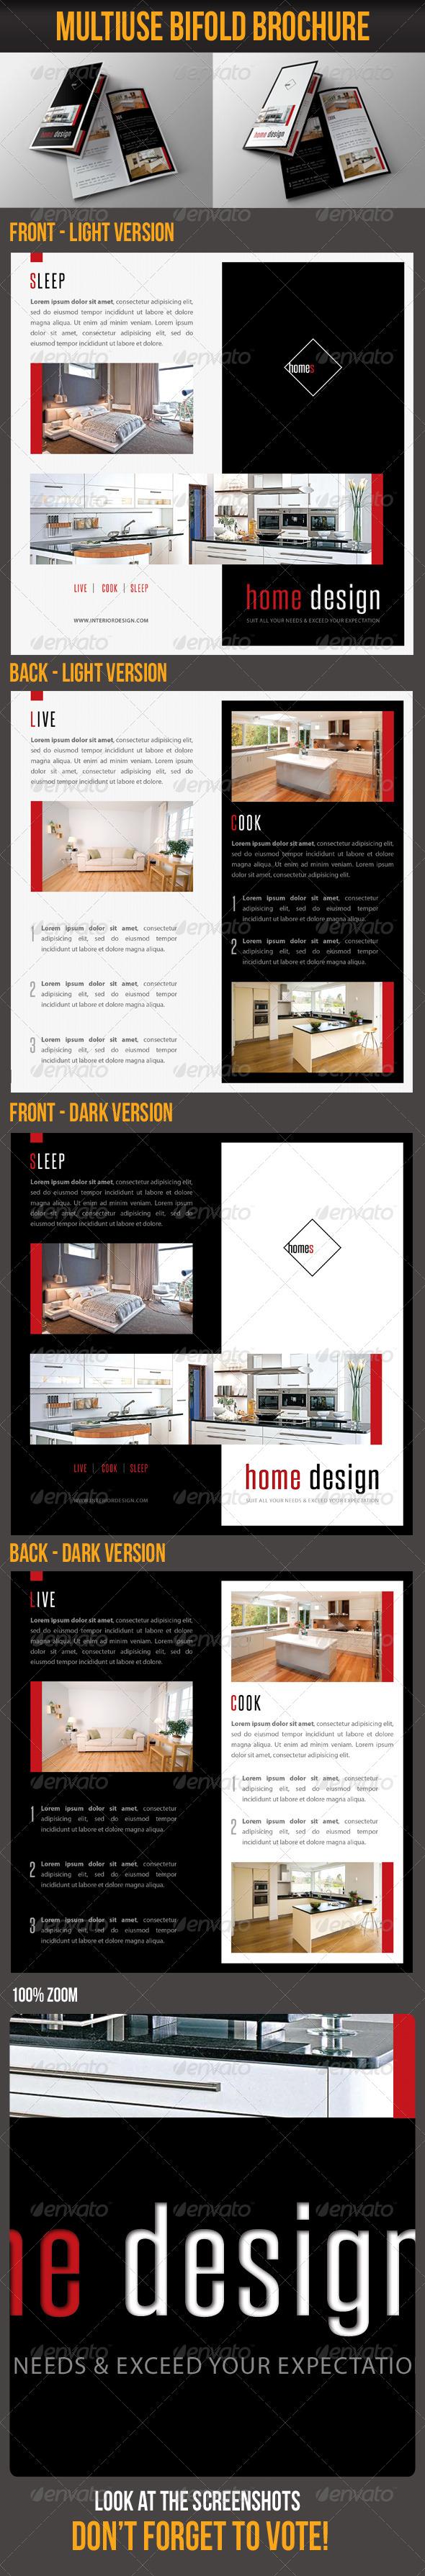 Multiuse Bifold Brochure 53 - Portfolio Brochures